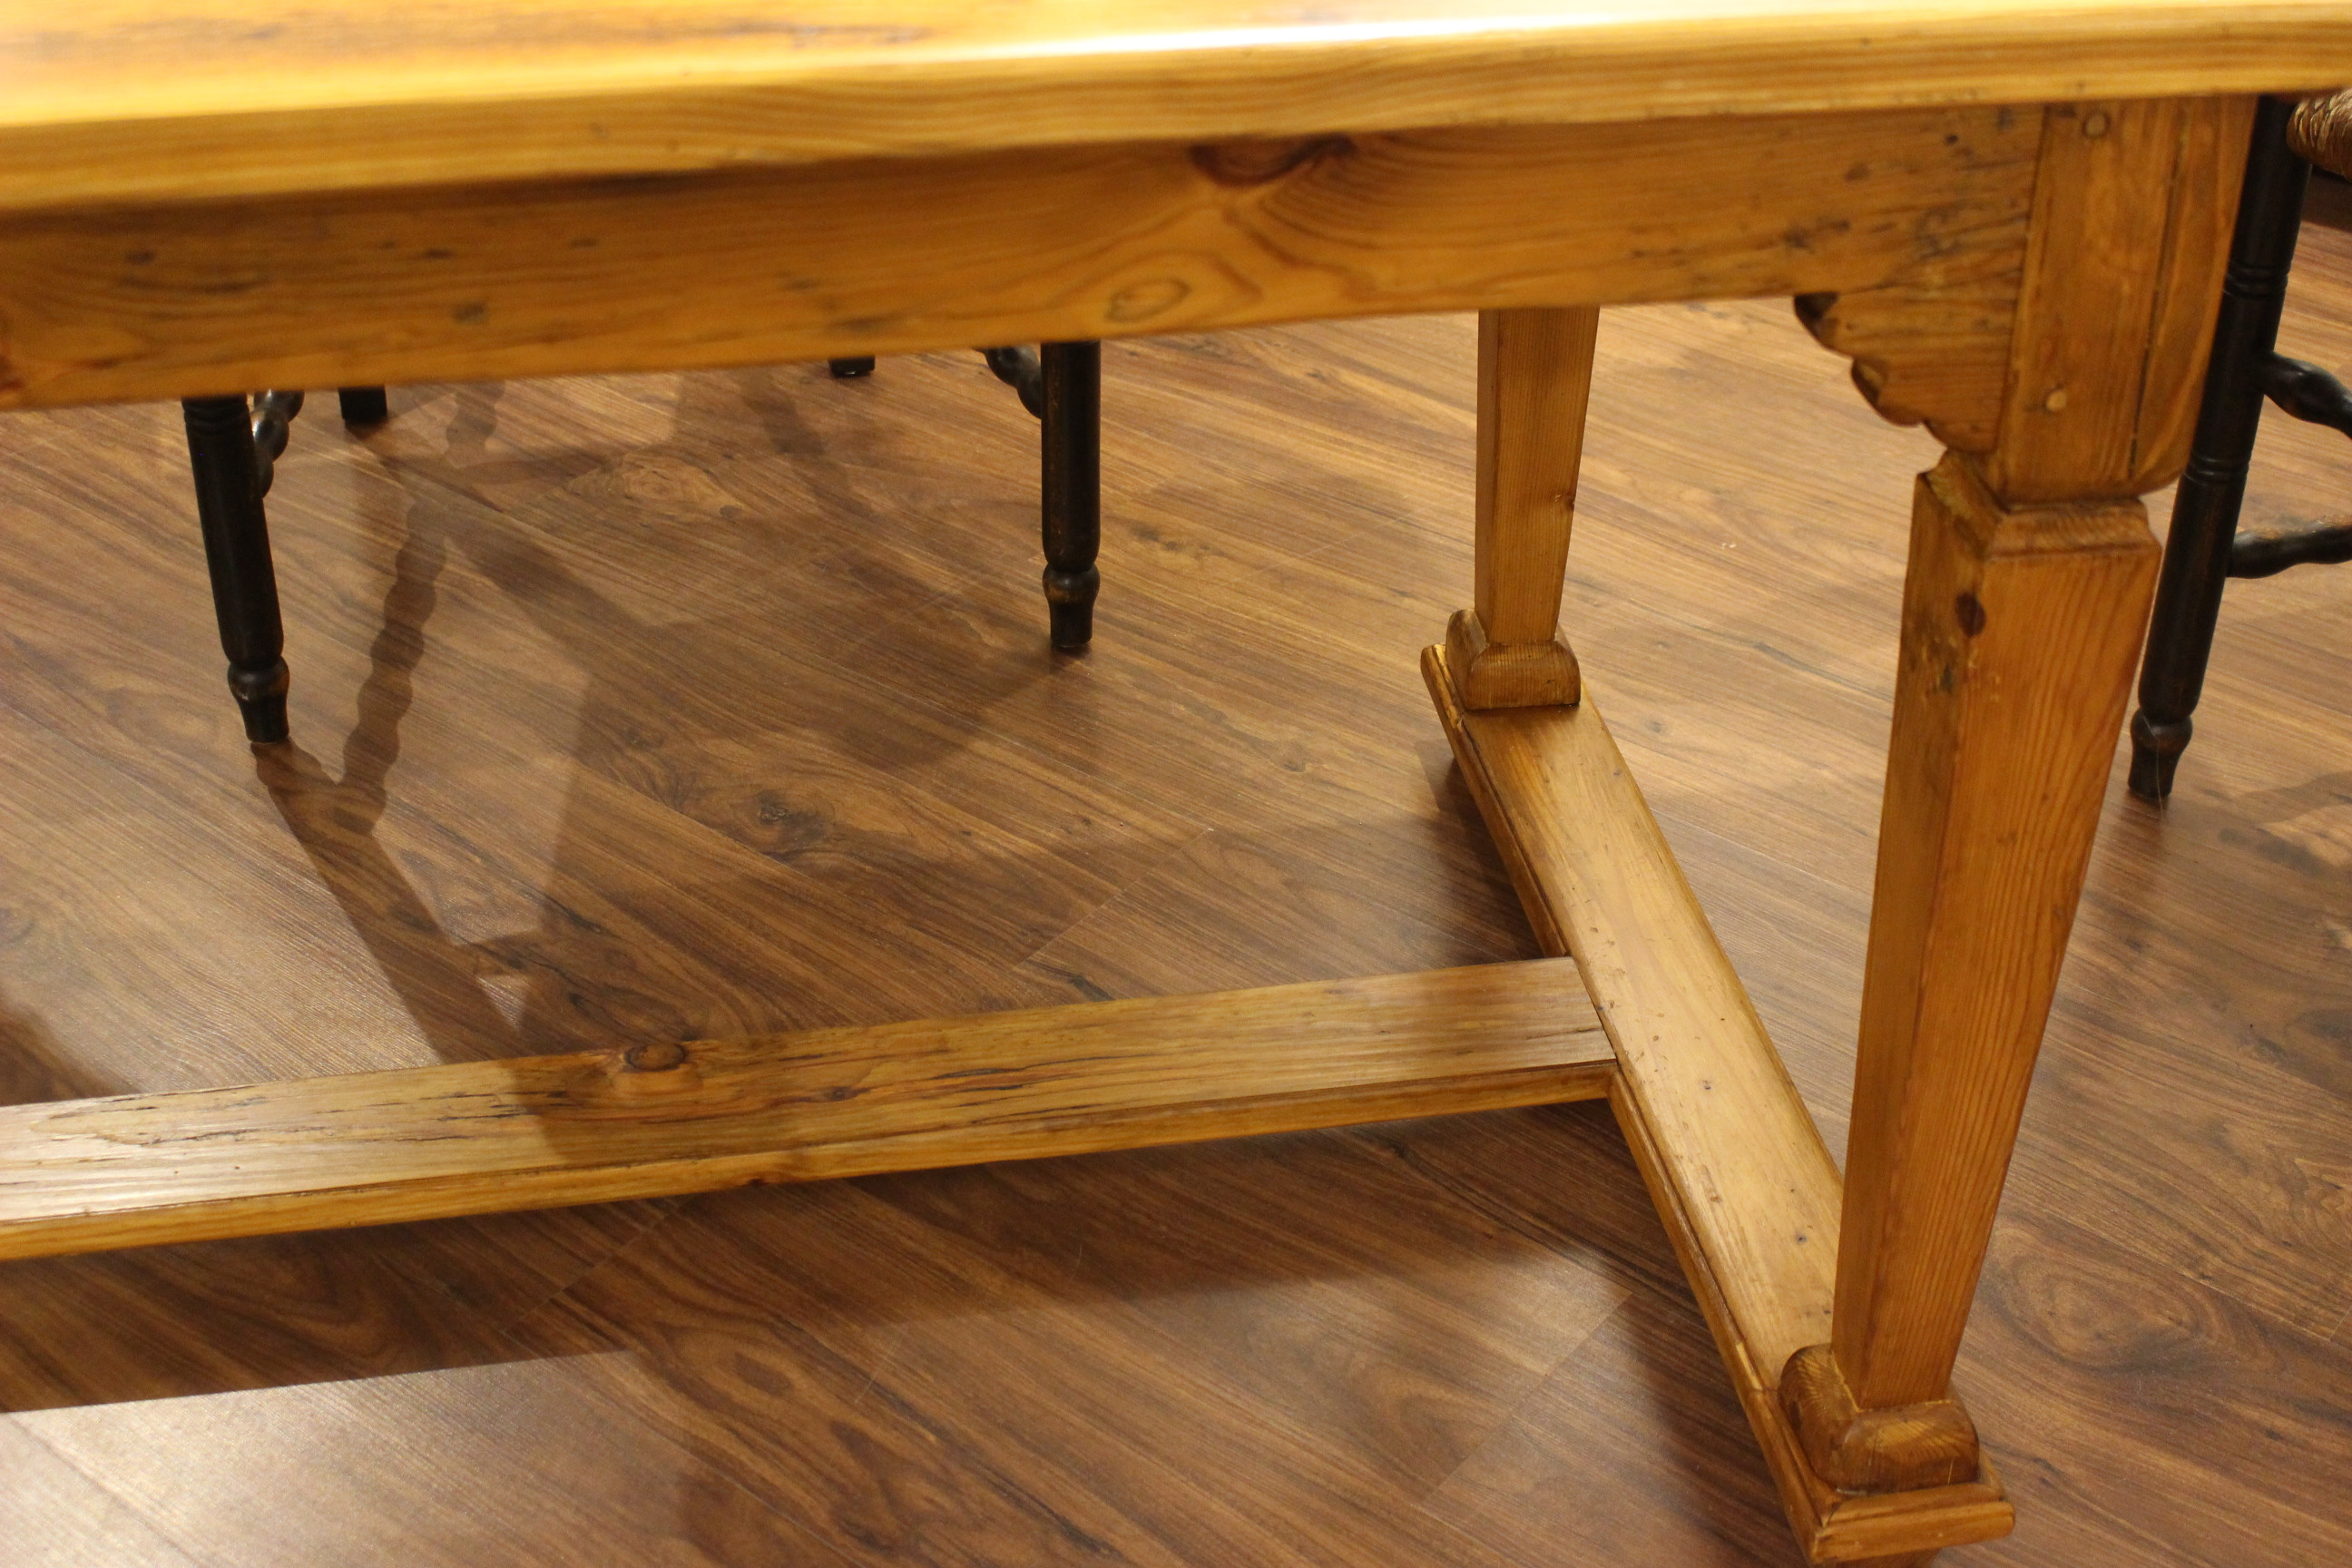 Tisch im Barockstil angefertigt (Art.-Nr. 03116)